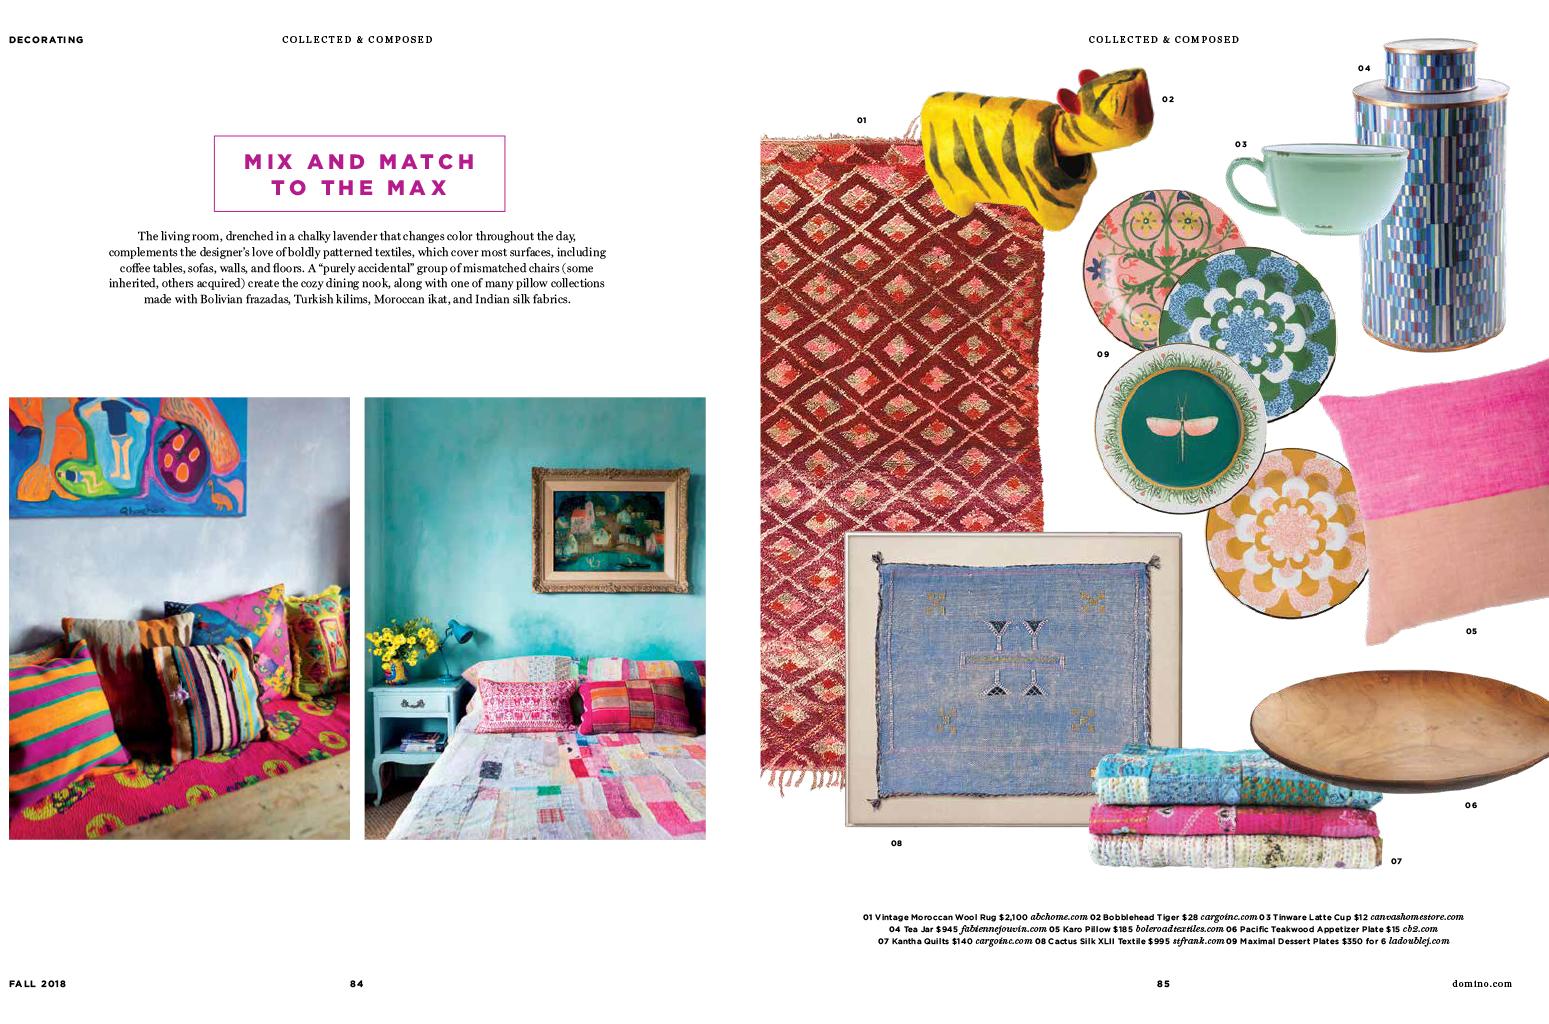 DominoMagazine - Fall 2018Featuring Cargo's Kantha Quiltsand Japanese Bobblehead's